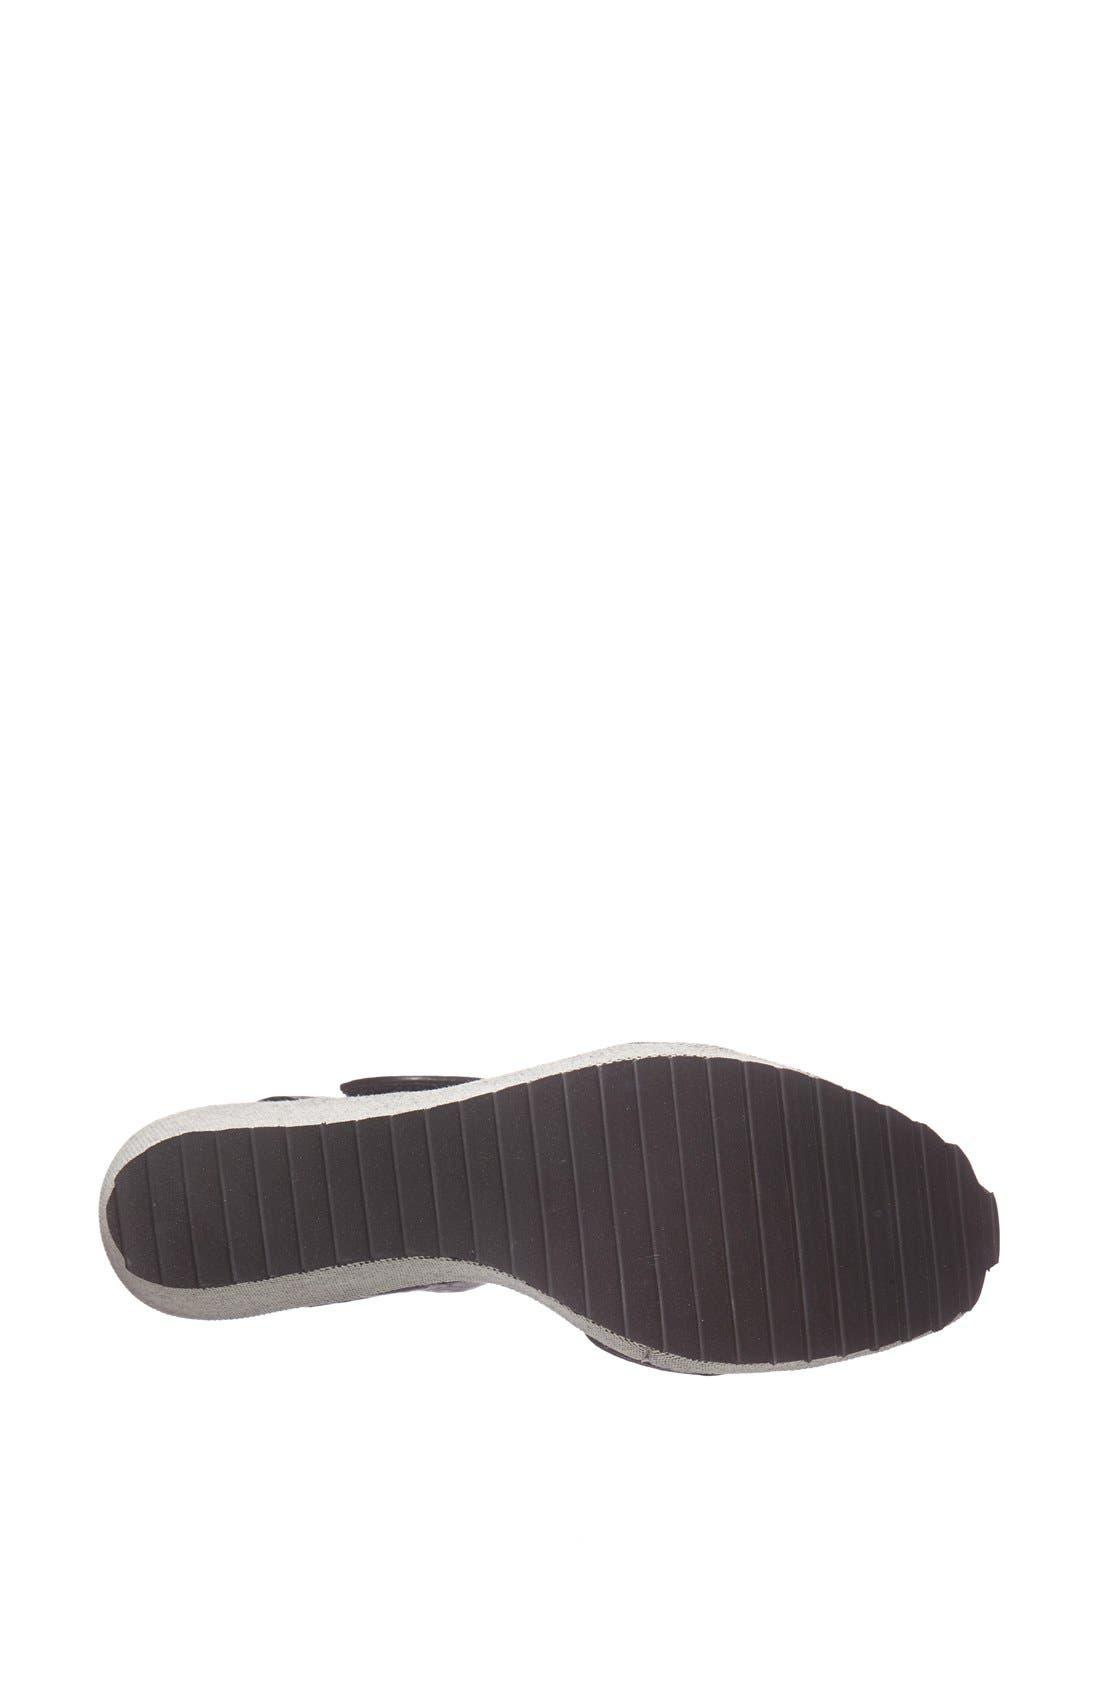 Alternate Image 3  - Pedro Garcia 'Freida' Crisscross Wedge Sandal